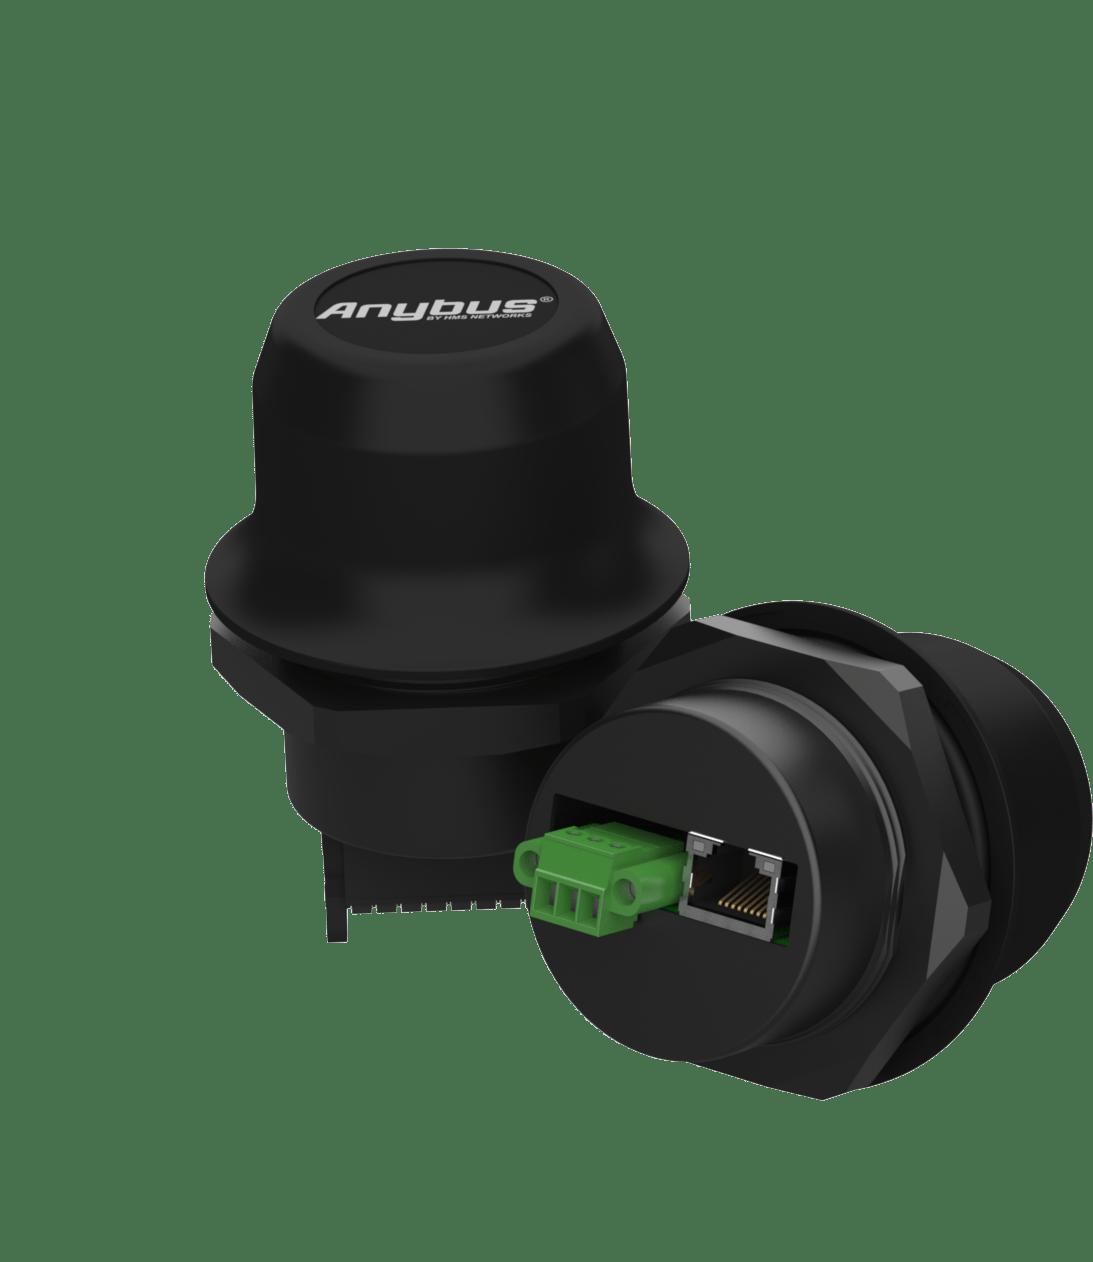 Anybus Wireless Bolt - Ethernet RJ45 PoE